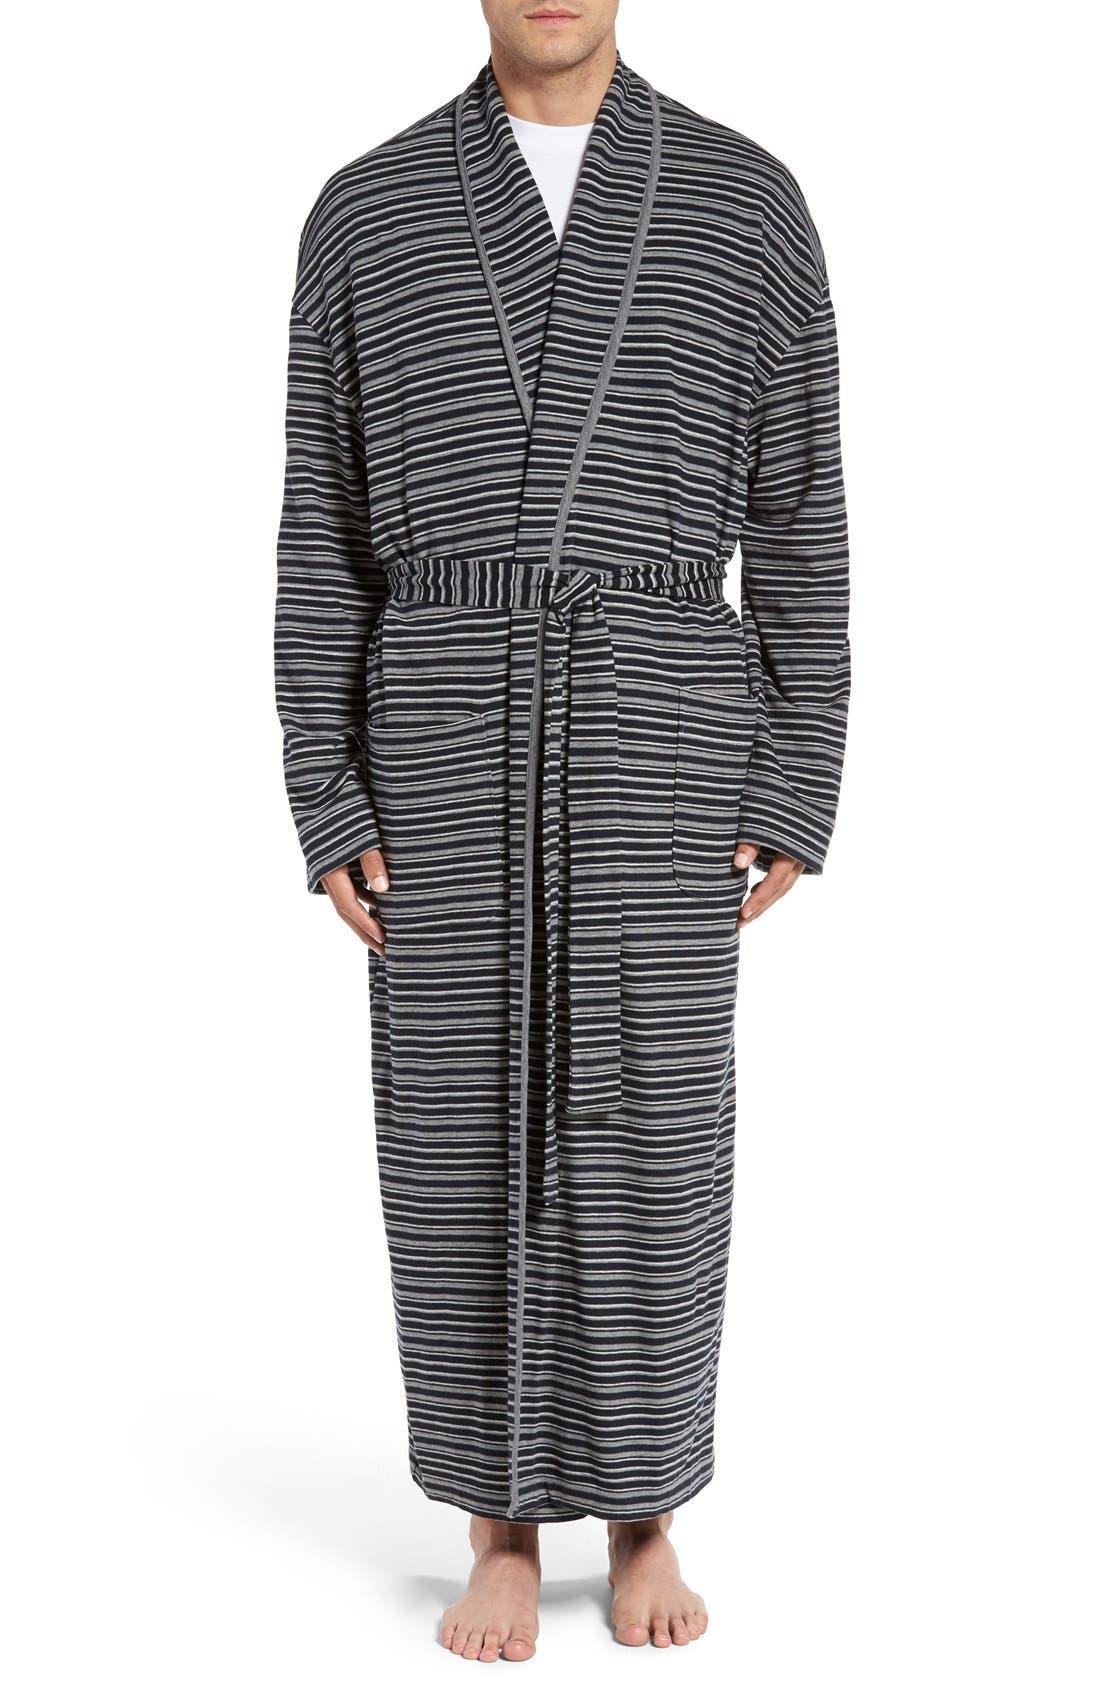 MAJESTIC INTERNATIONAL 'Pure/Simple' Cotton Robe